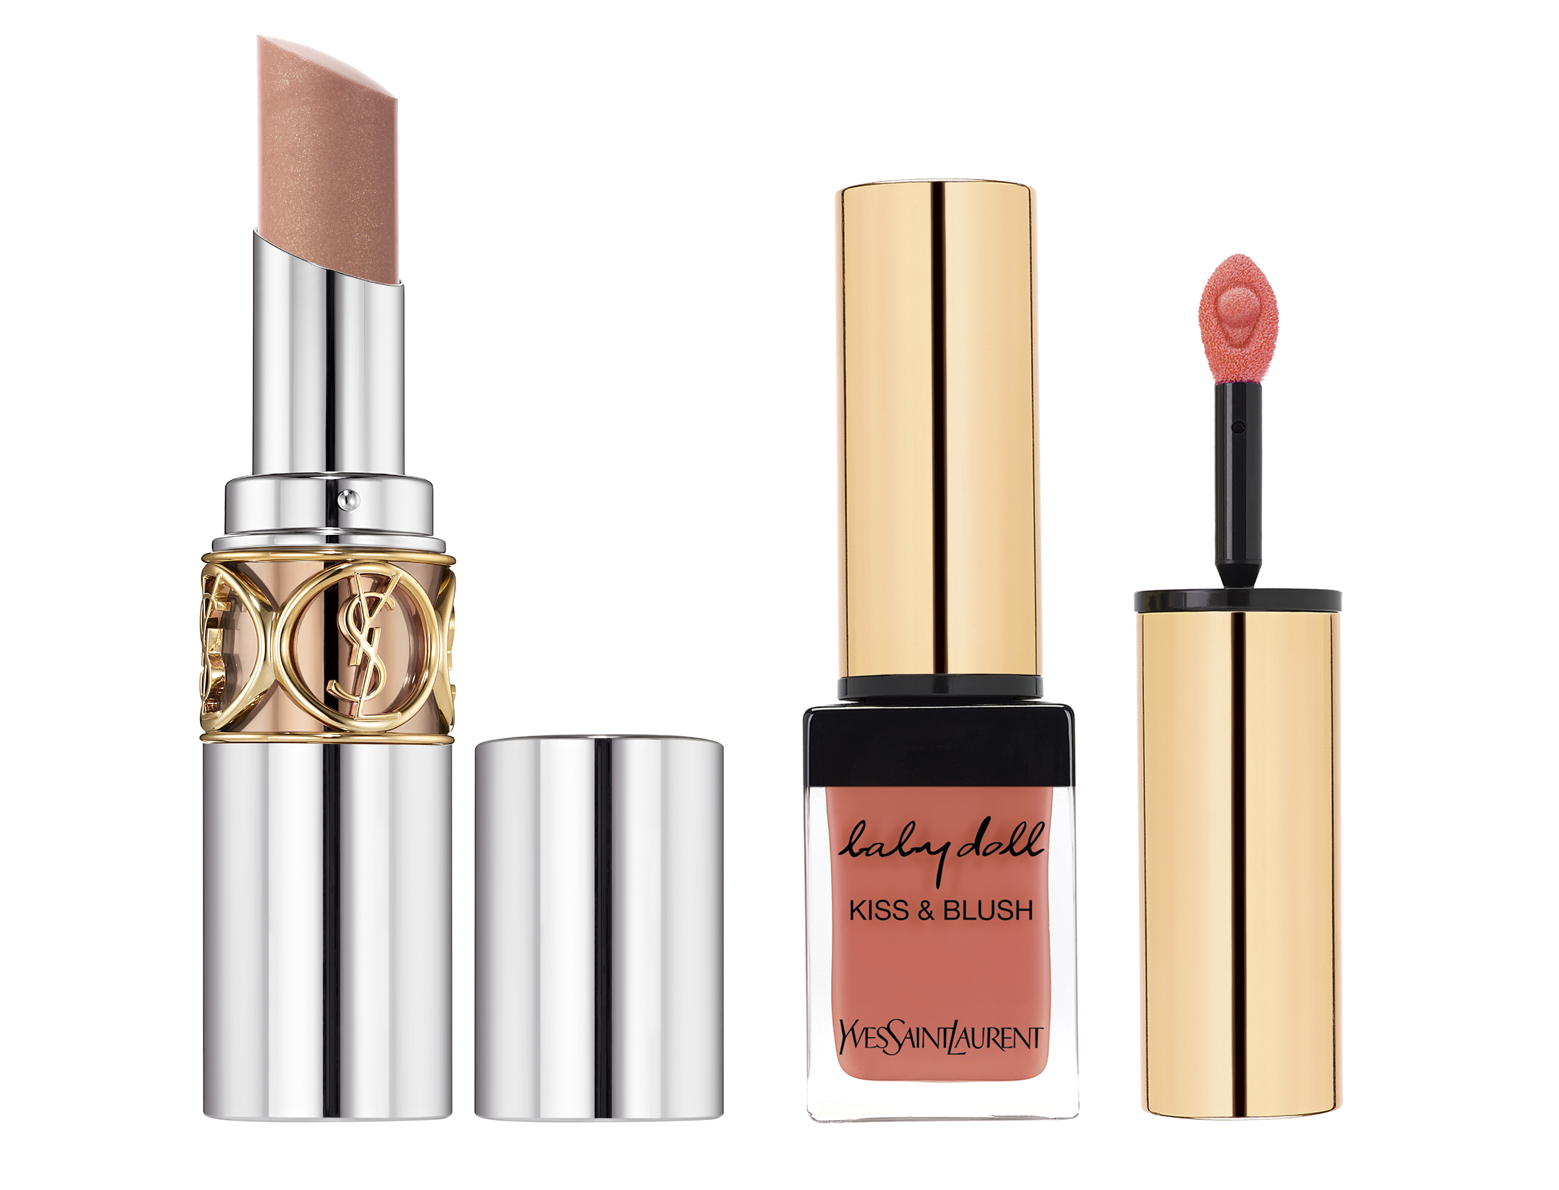 YSL Jessica Chastain maquillaje de labios